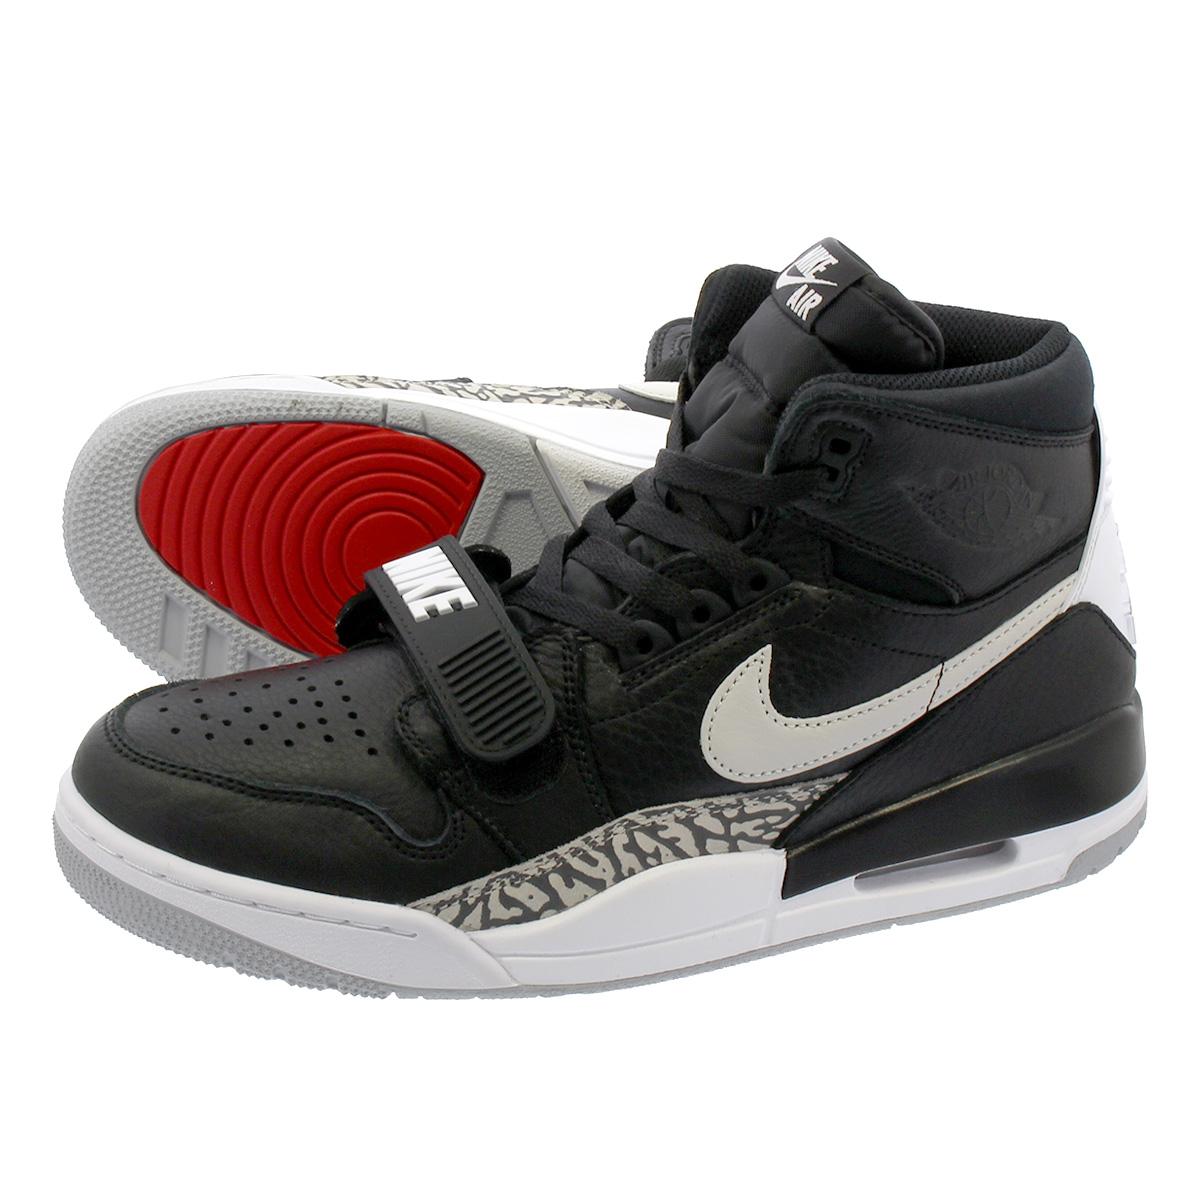 reputable site 30a7c d0451 NIKE AIR JORDAN LEGACY 312 Nike Air Jordan Legacy 312 BLACK WHITE av3922-001